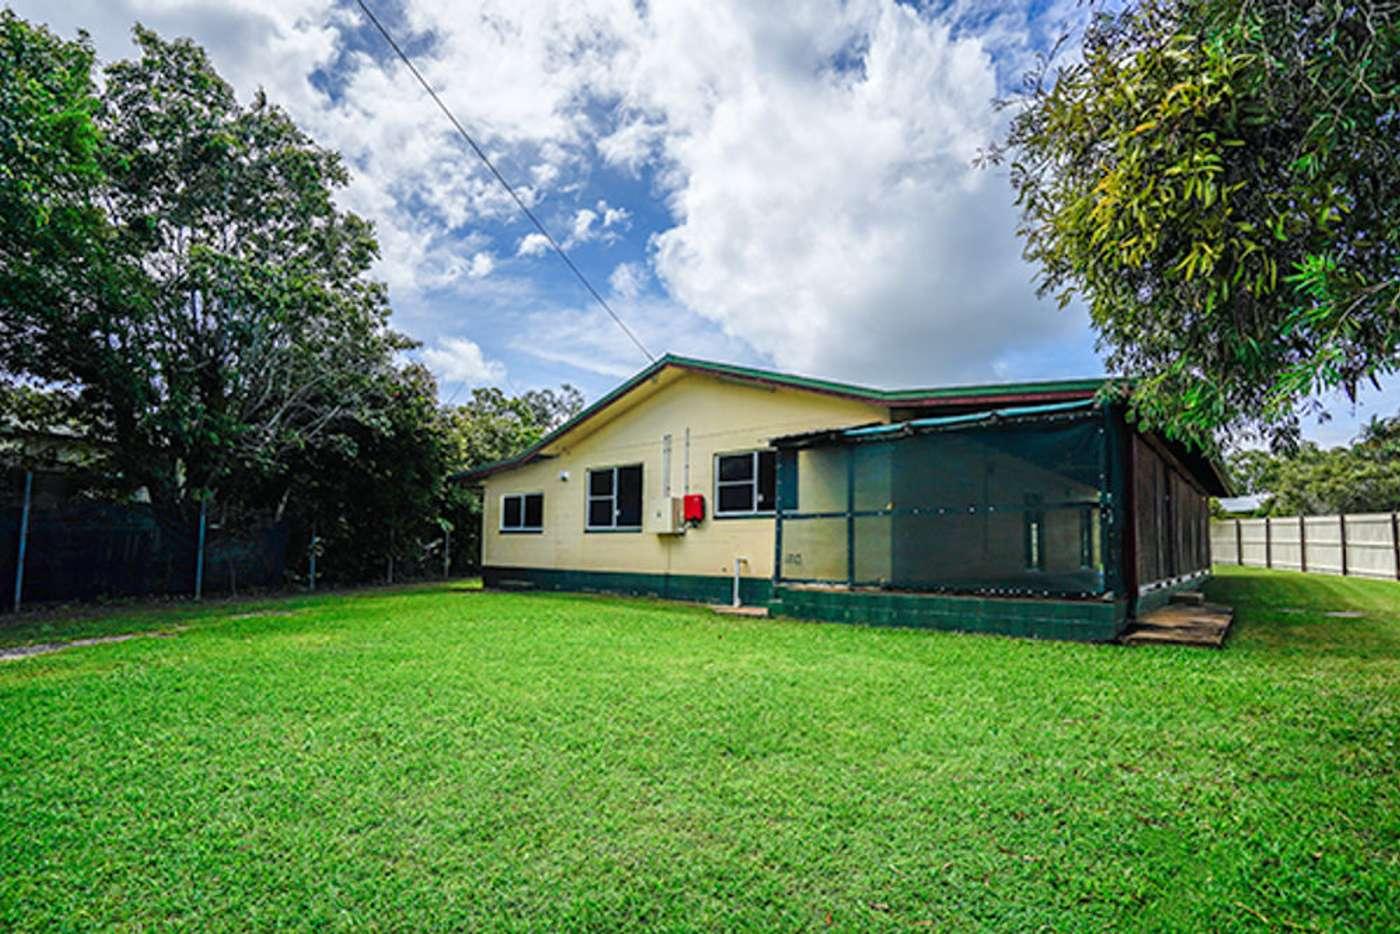 Main view of Homely house listing, 1 Brodziac Close, Mareeba QLD 4880